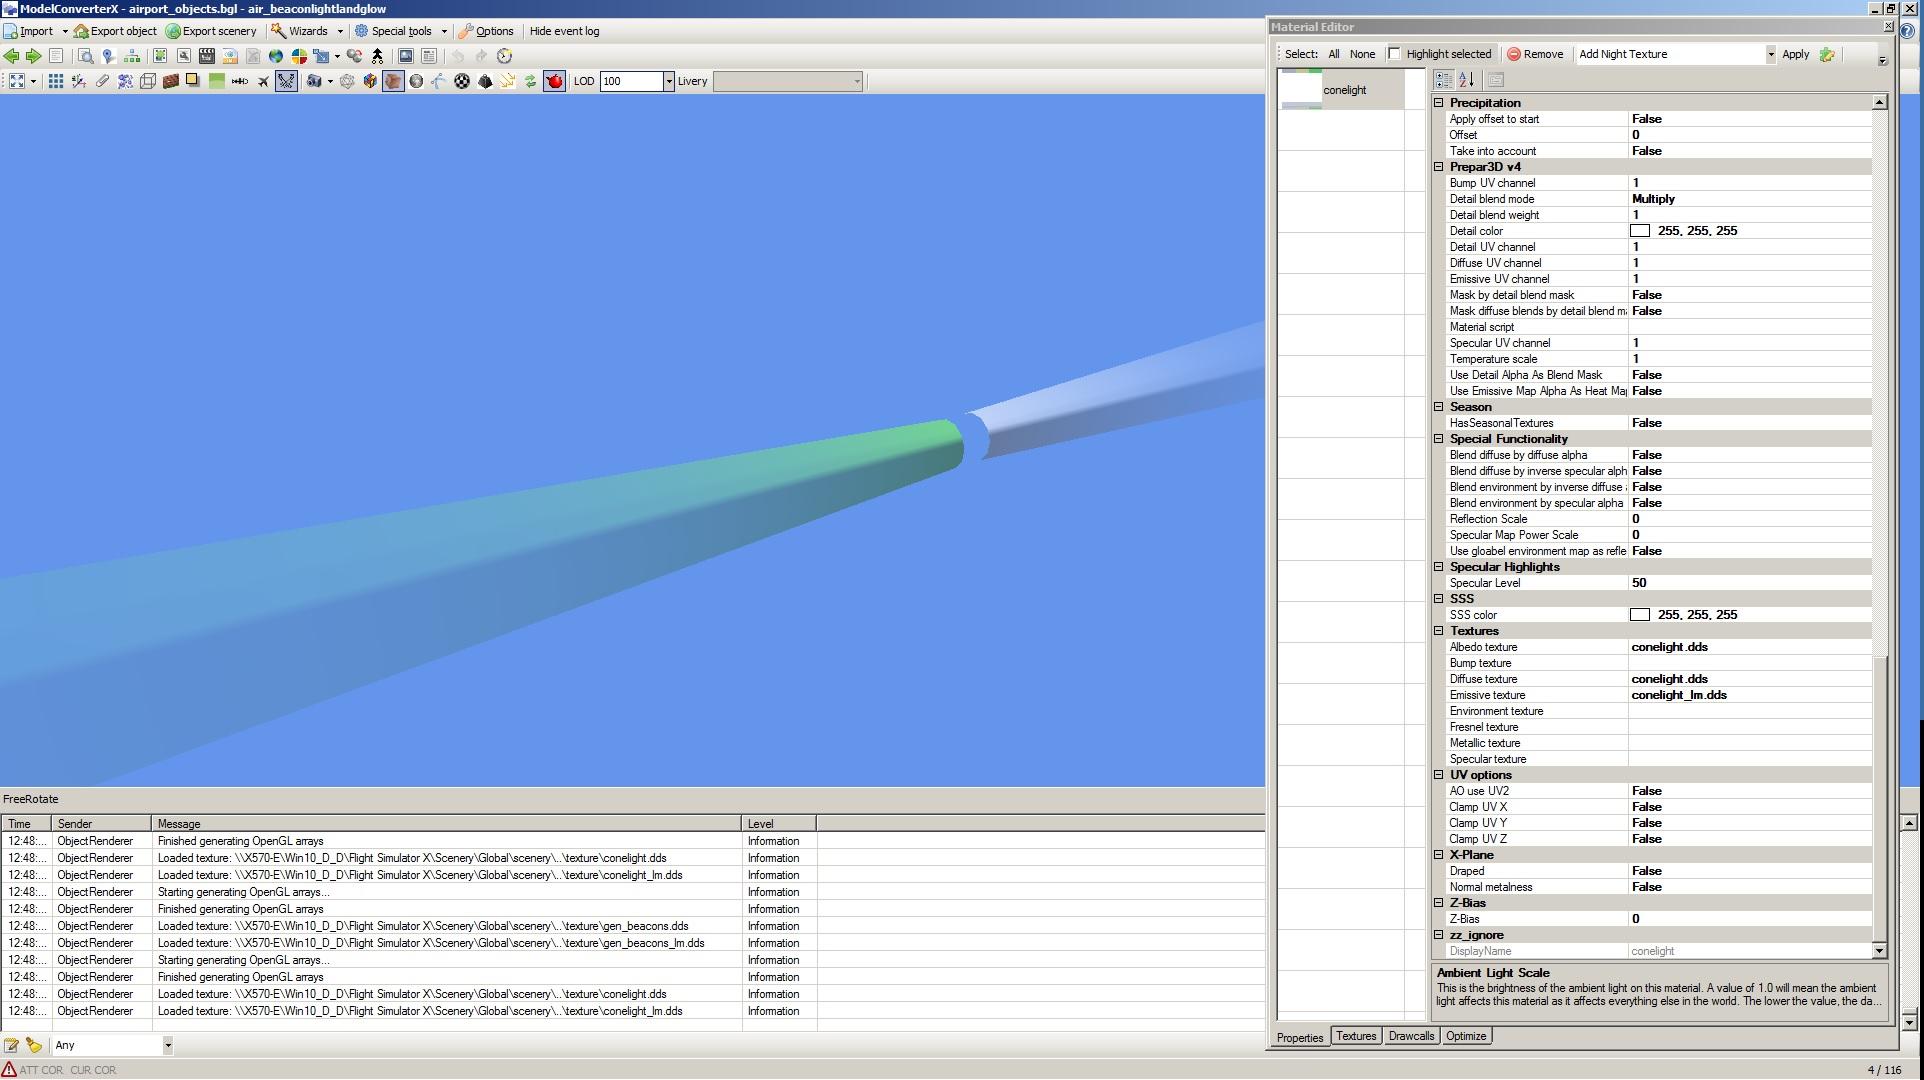 fsx_sp2_default_civilian_rotating_airport_beacon_light_cones_material_properties-3-jpg-jpg.69599